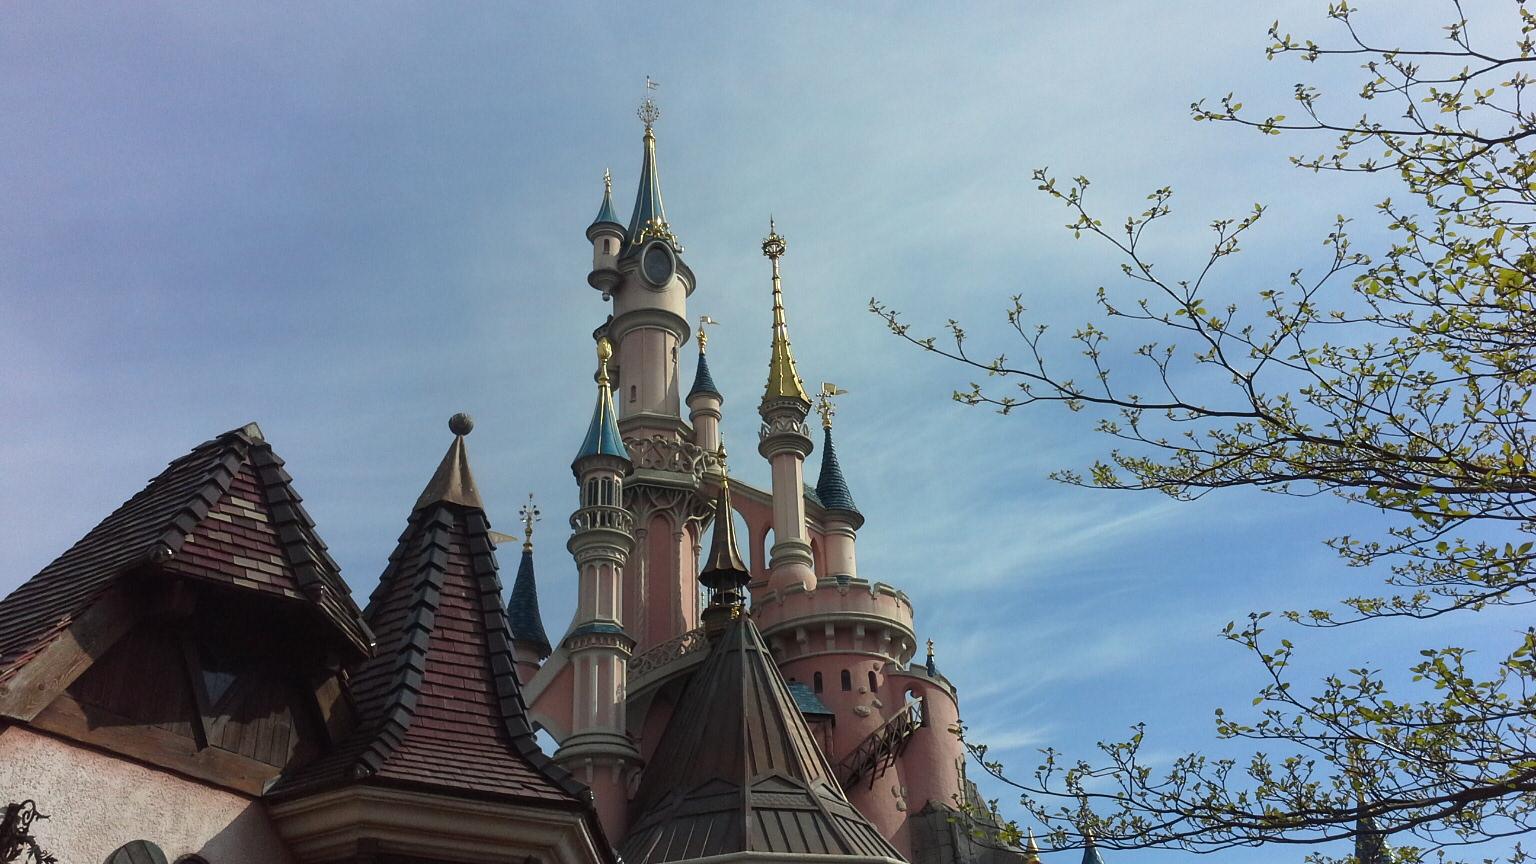 castello cenerentola